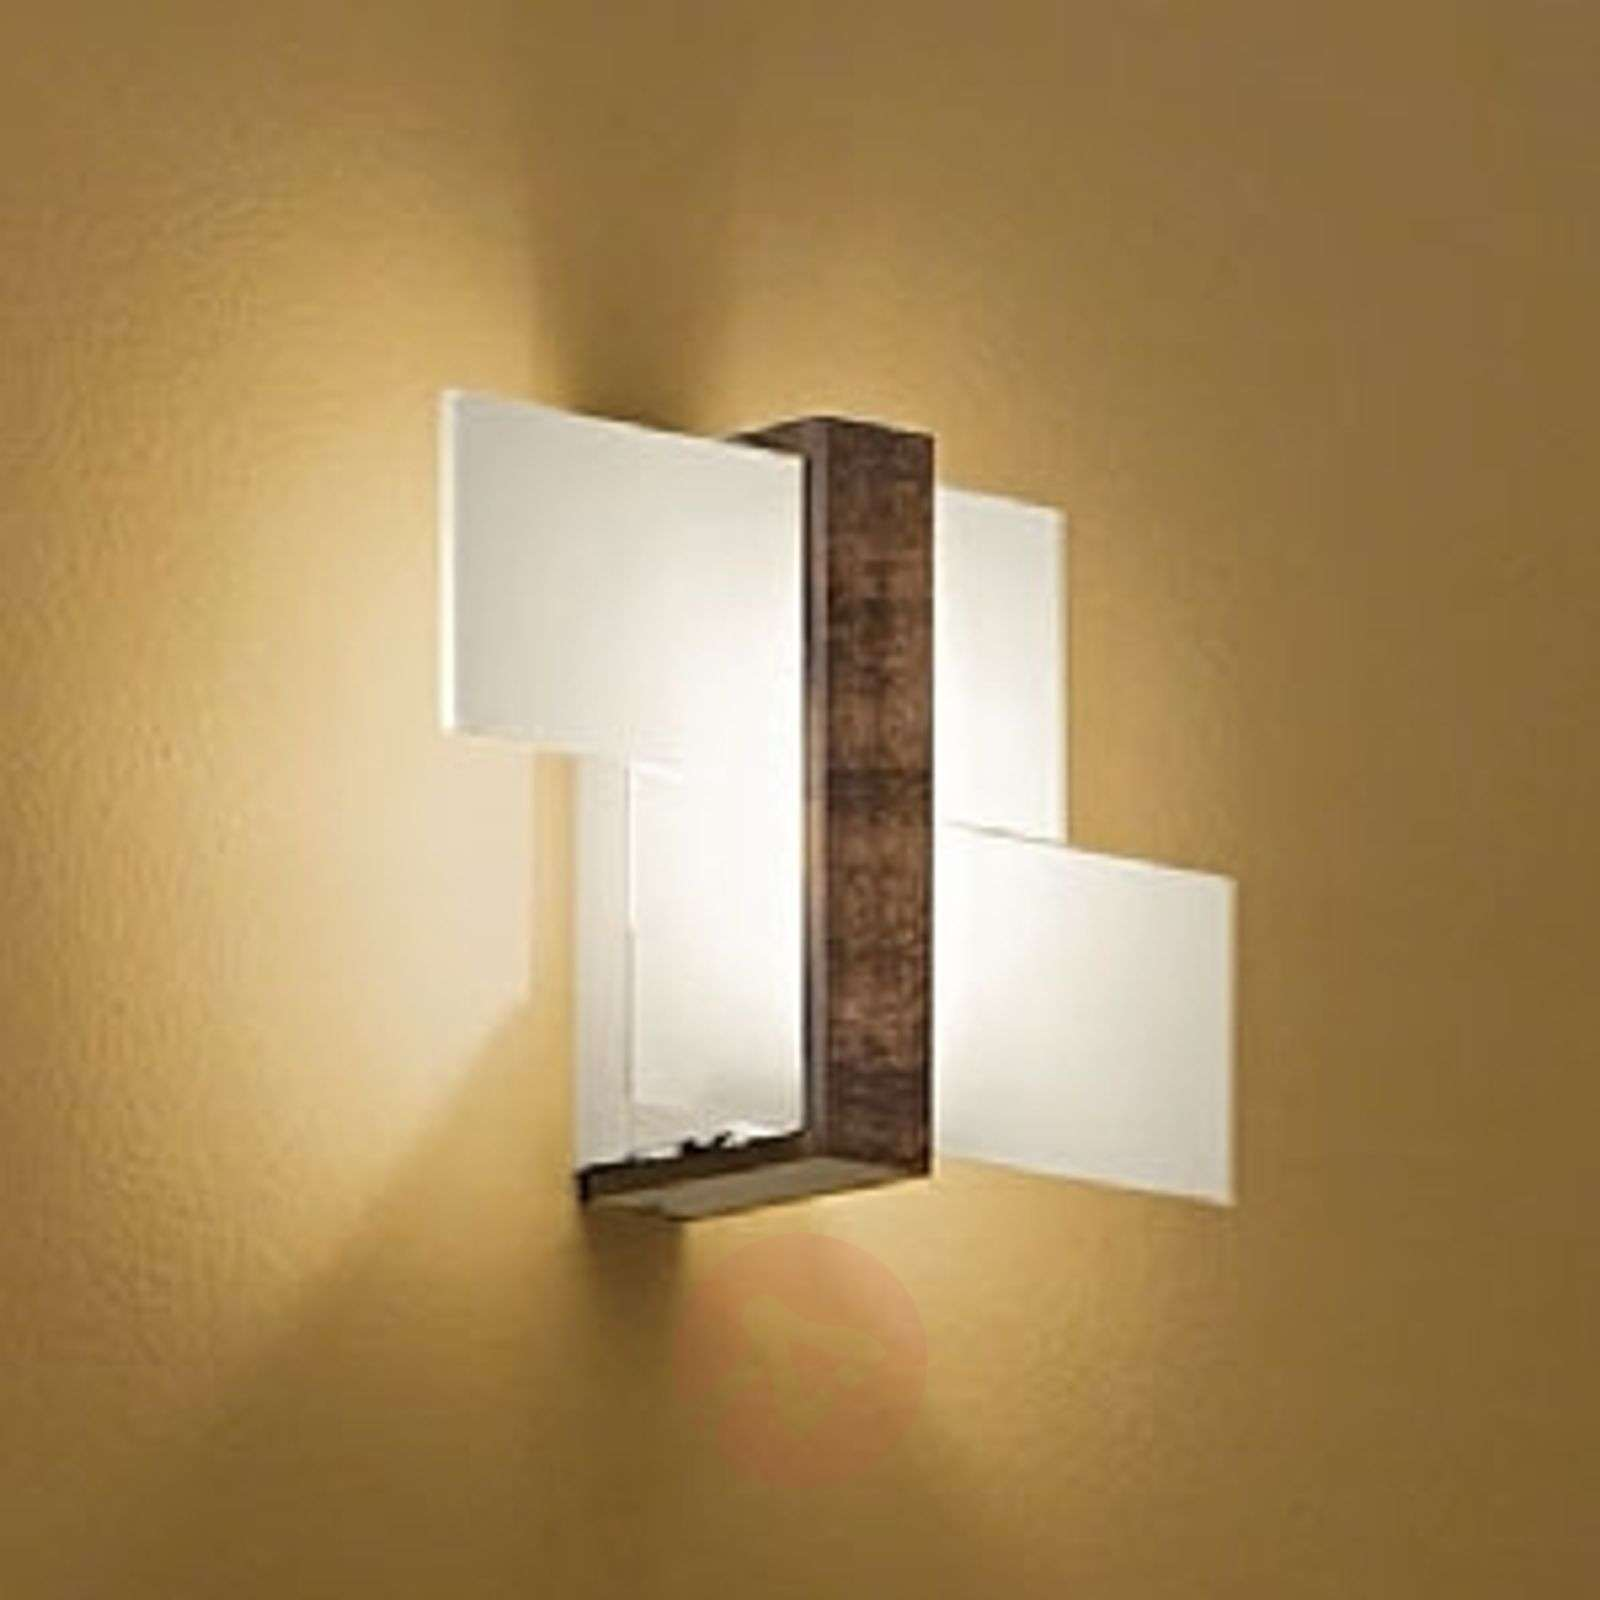 puinen Triad-seinävalaisin 35 cm-6043235-01